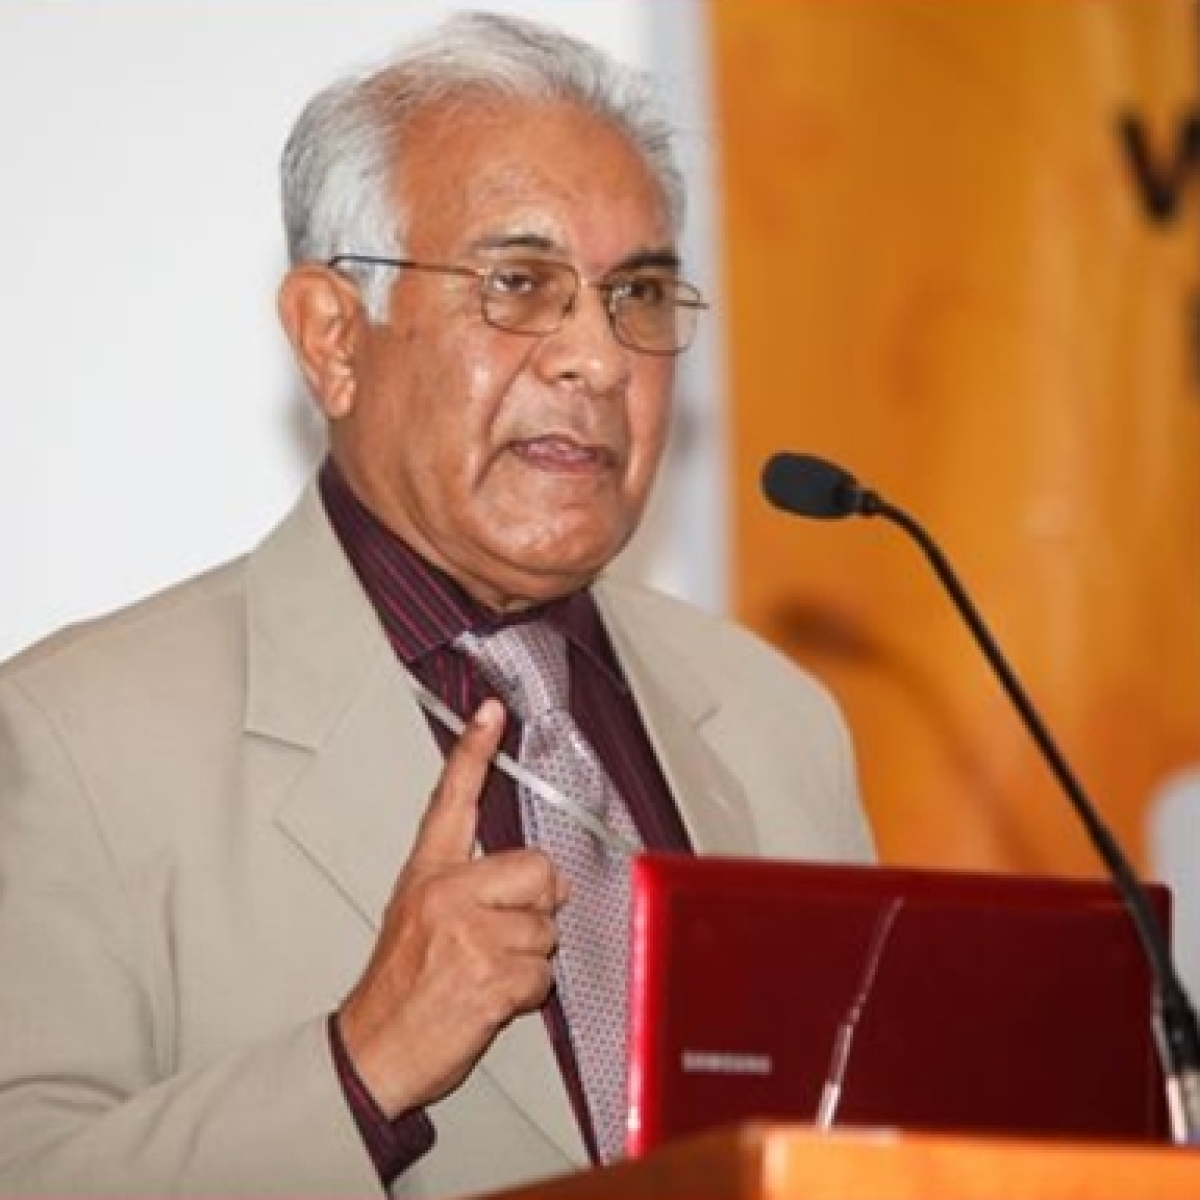 Shaheen Bagh: Police, not protestors responsible Former CIC Wajahat Habibullah